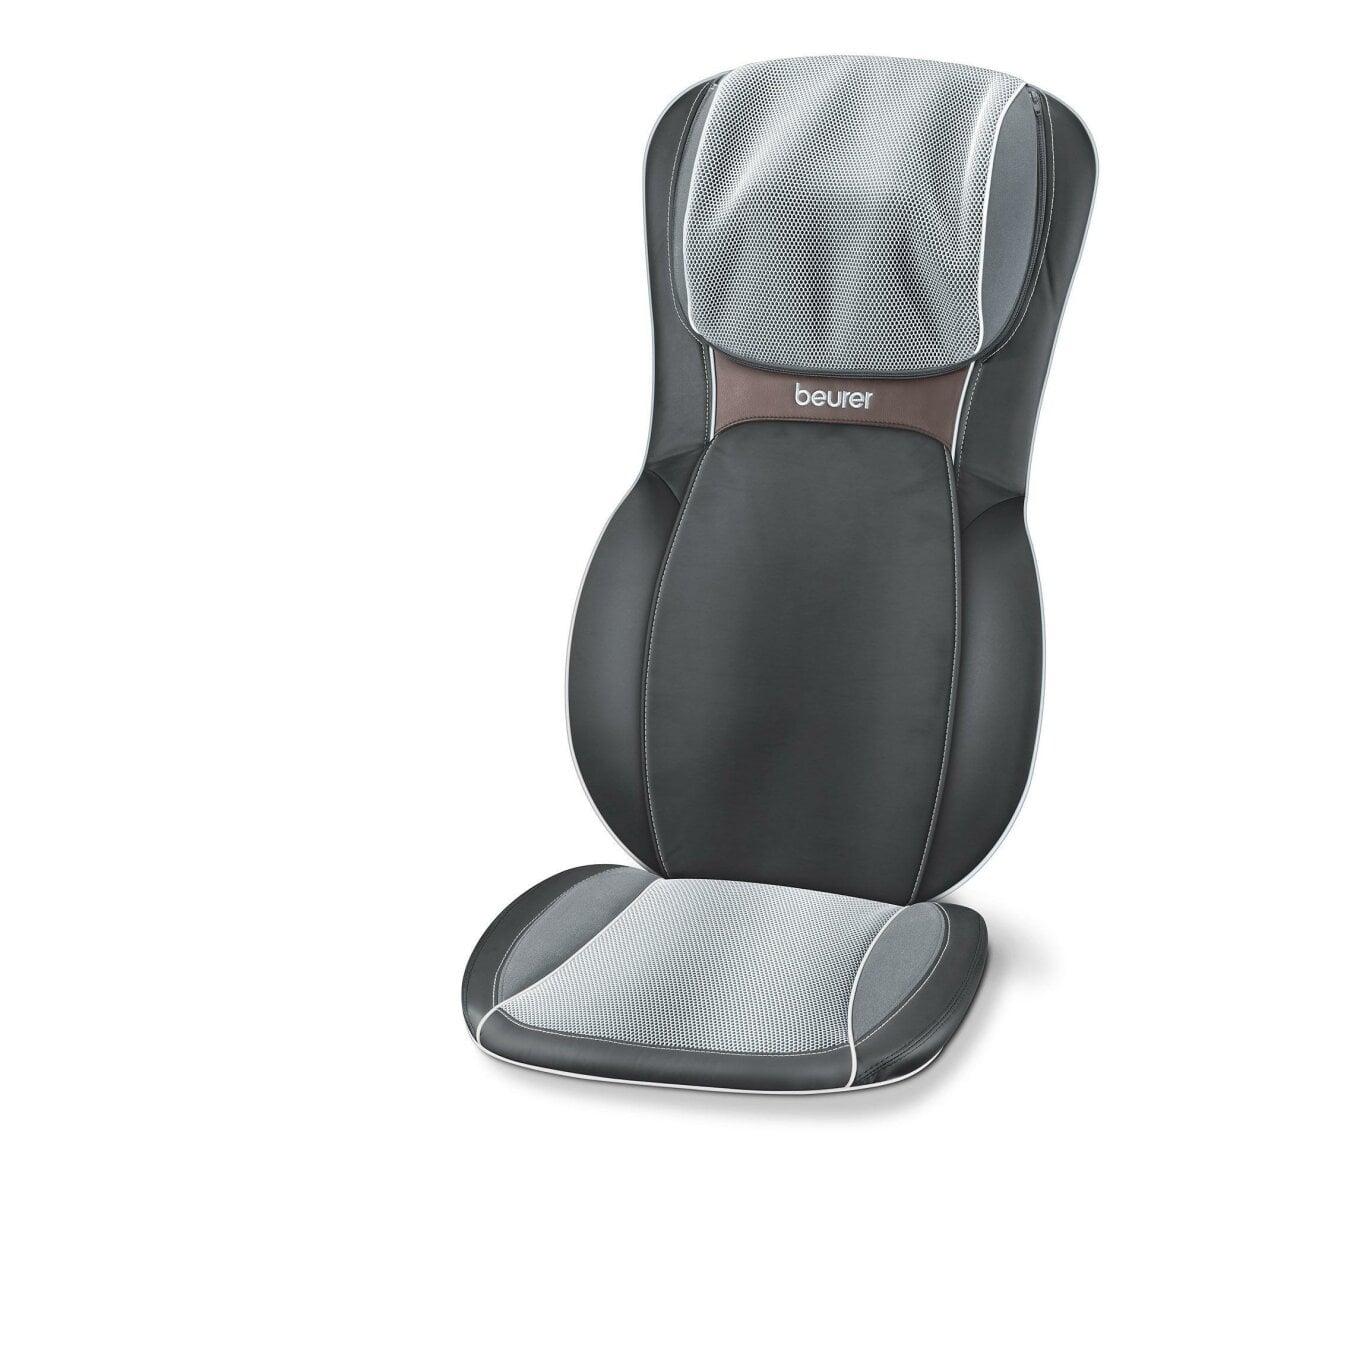 Coprisedile per massaggio shiatsu di Beurer - MG 295 - HD 3D black